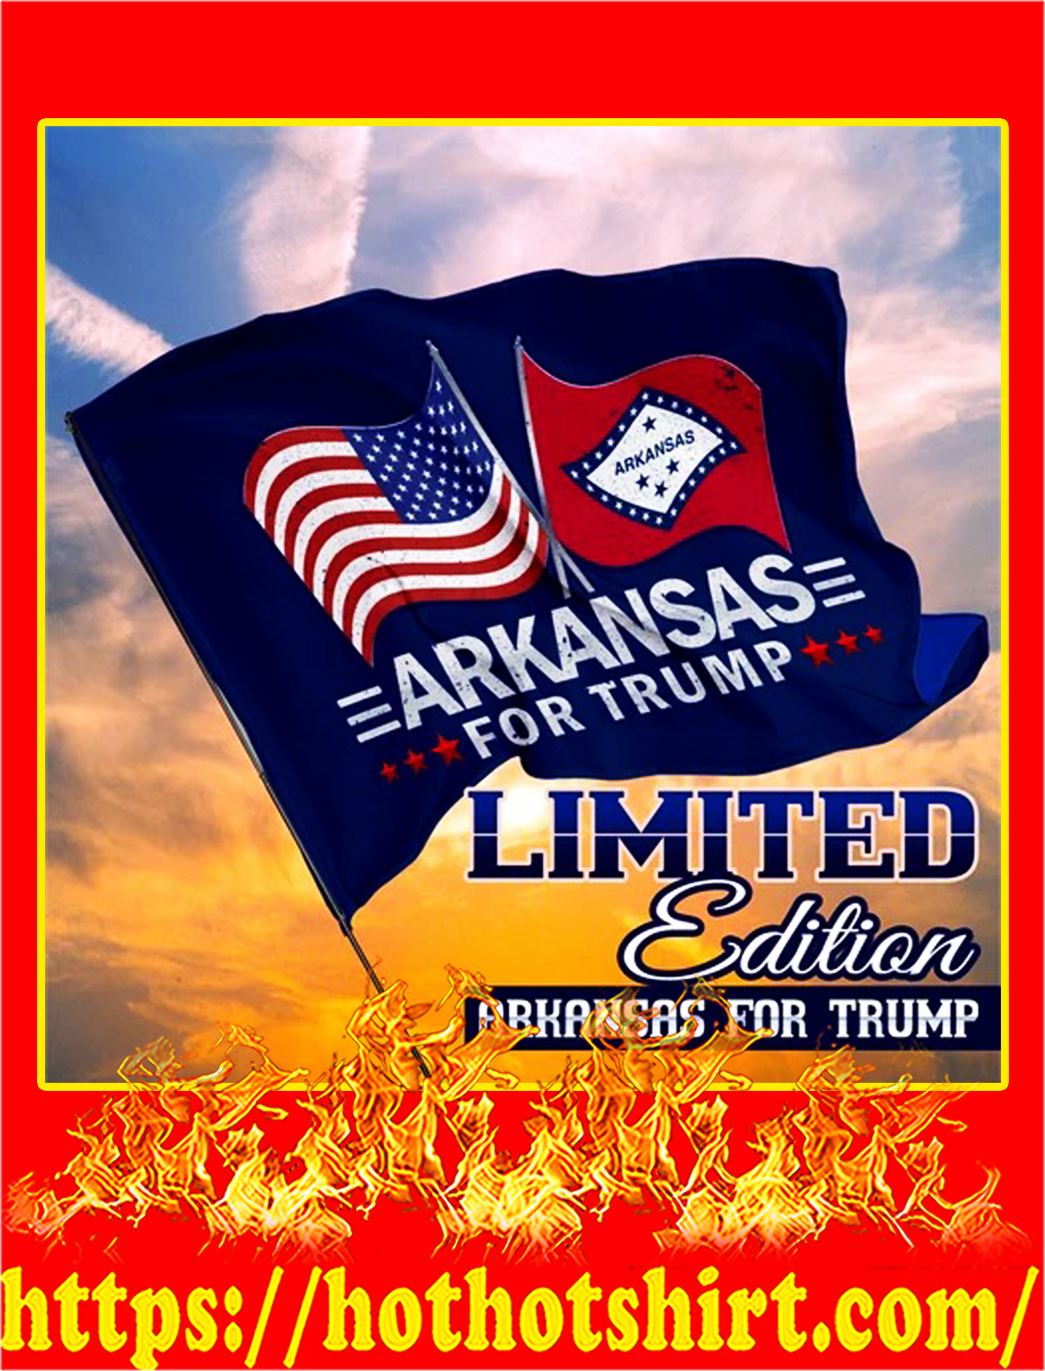 Arkansas for trump flag - pic 1